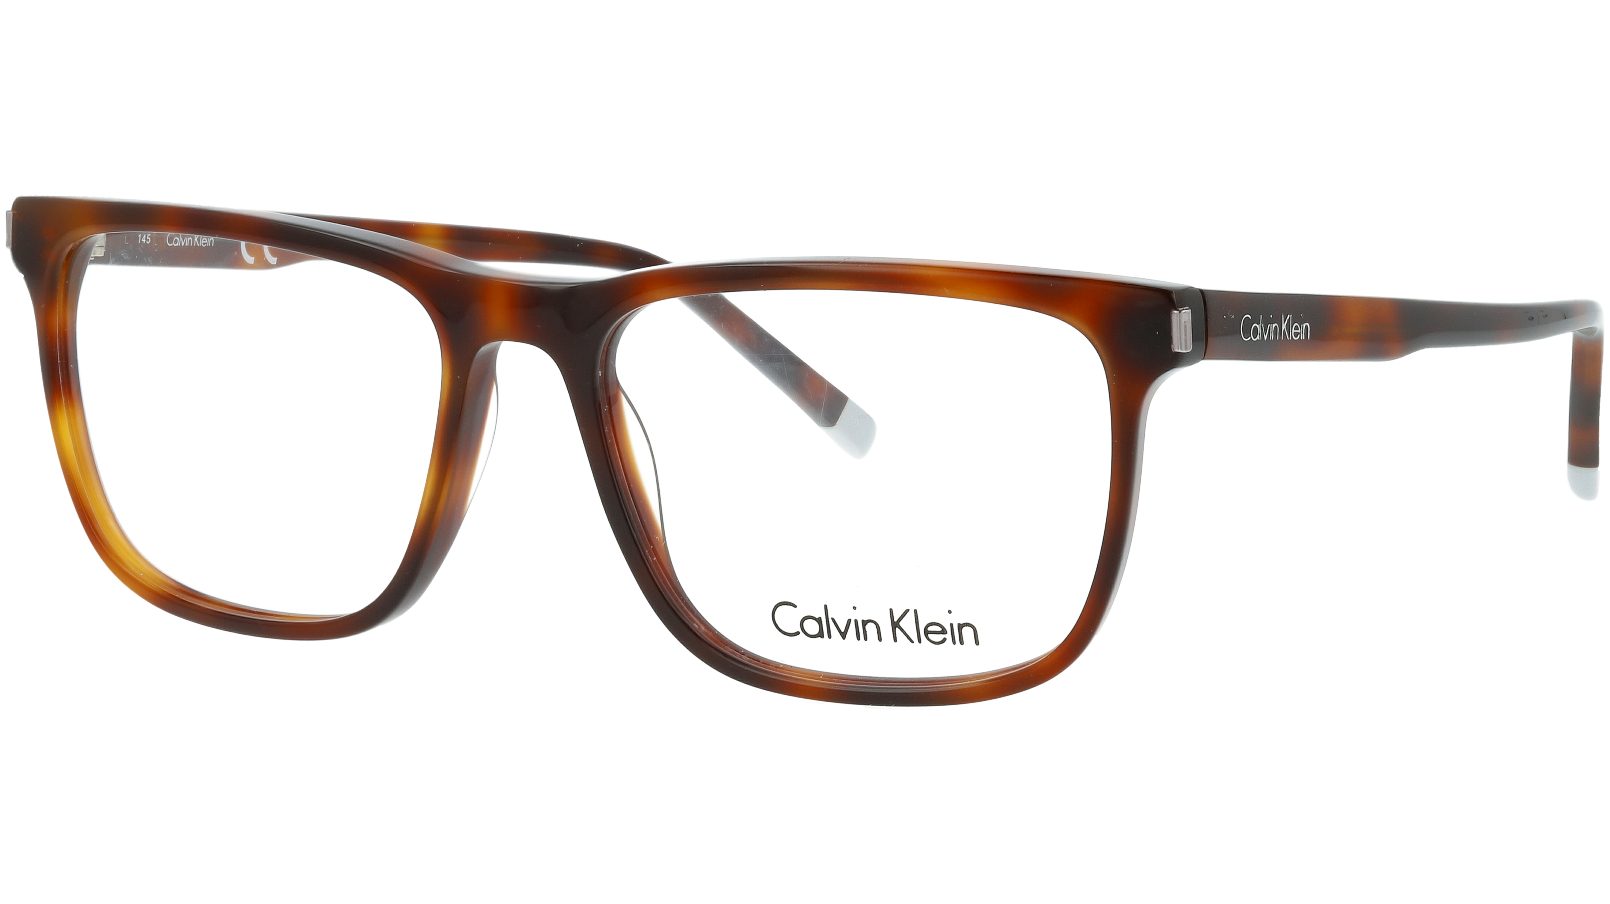 Calvin Klein CK5974 214 55 Havana Glasses